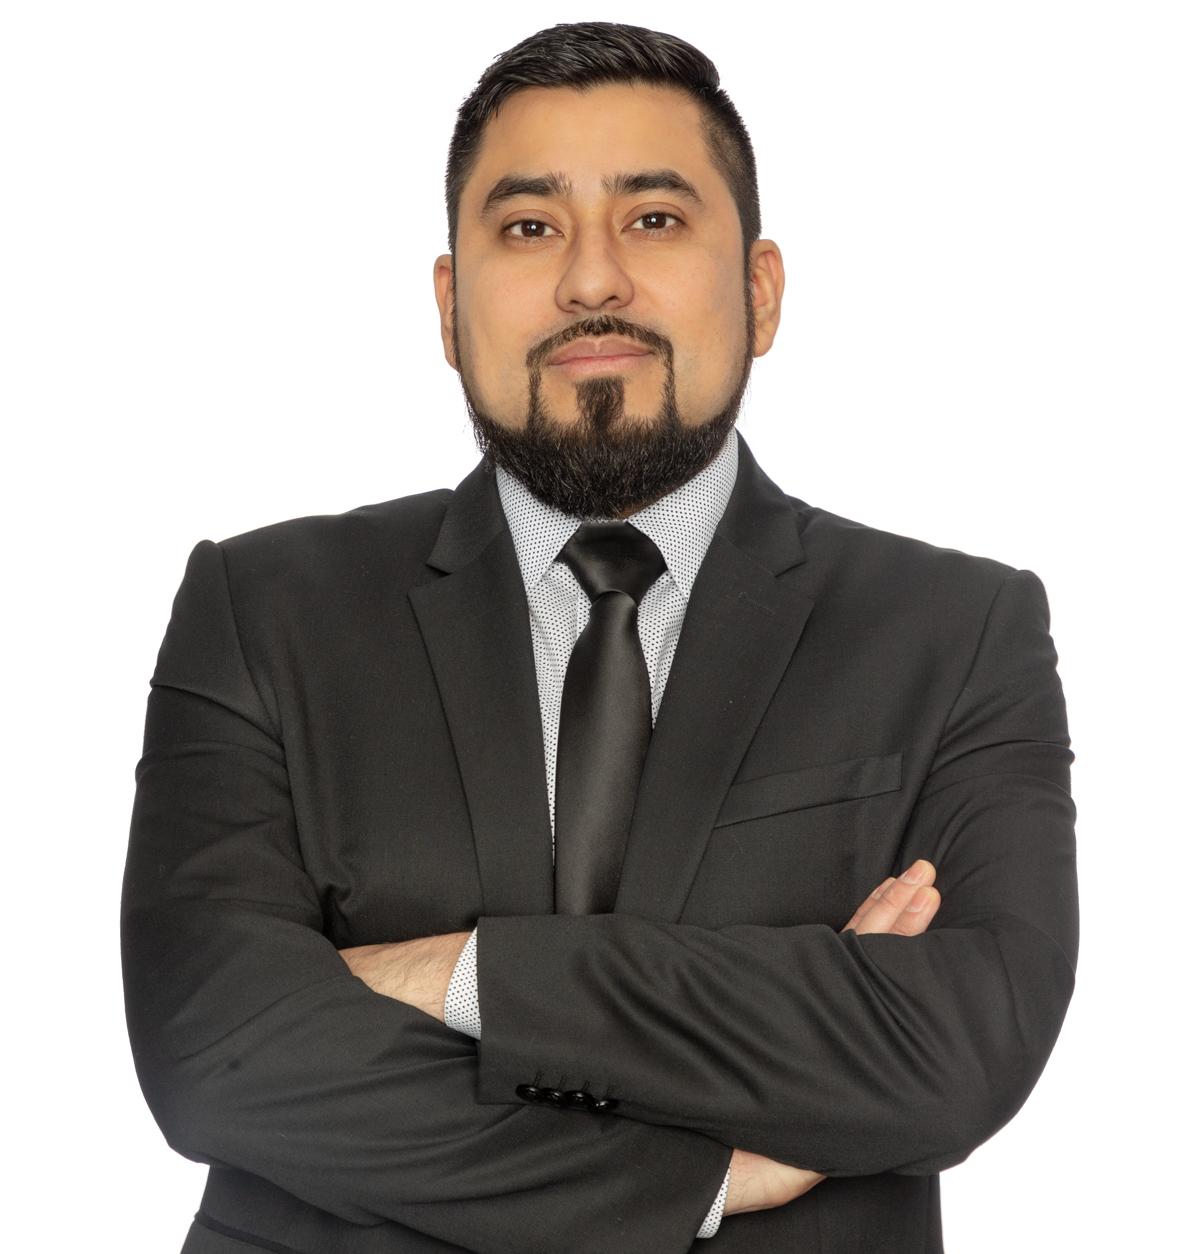 Armando Paz Dominguez Operations & Finance Assistant